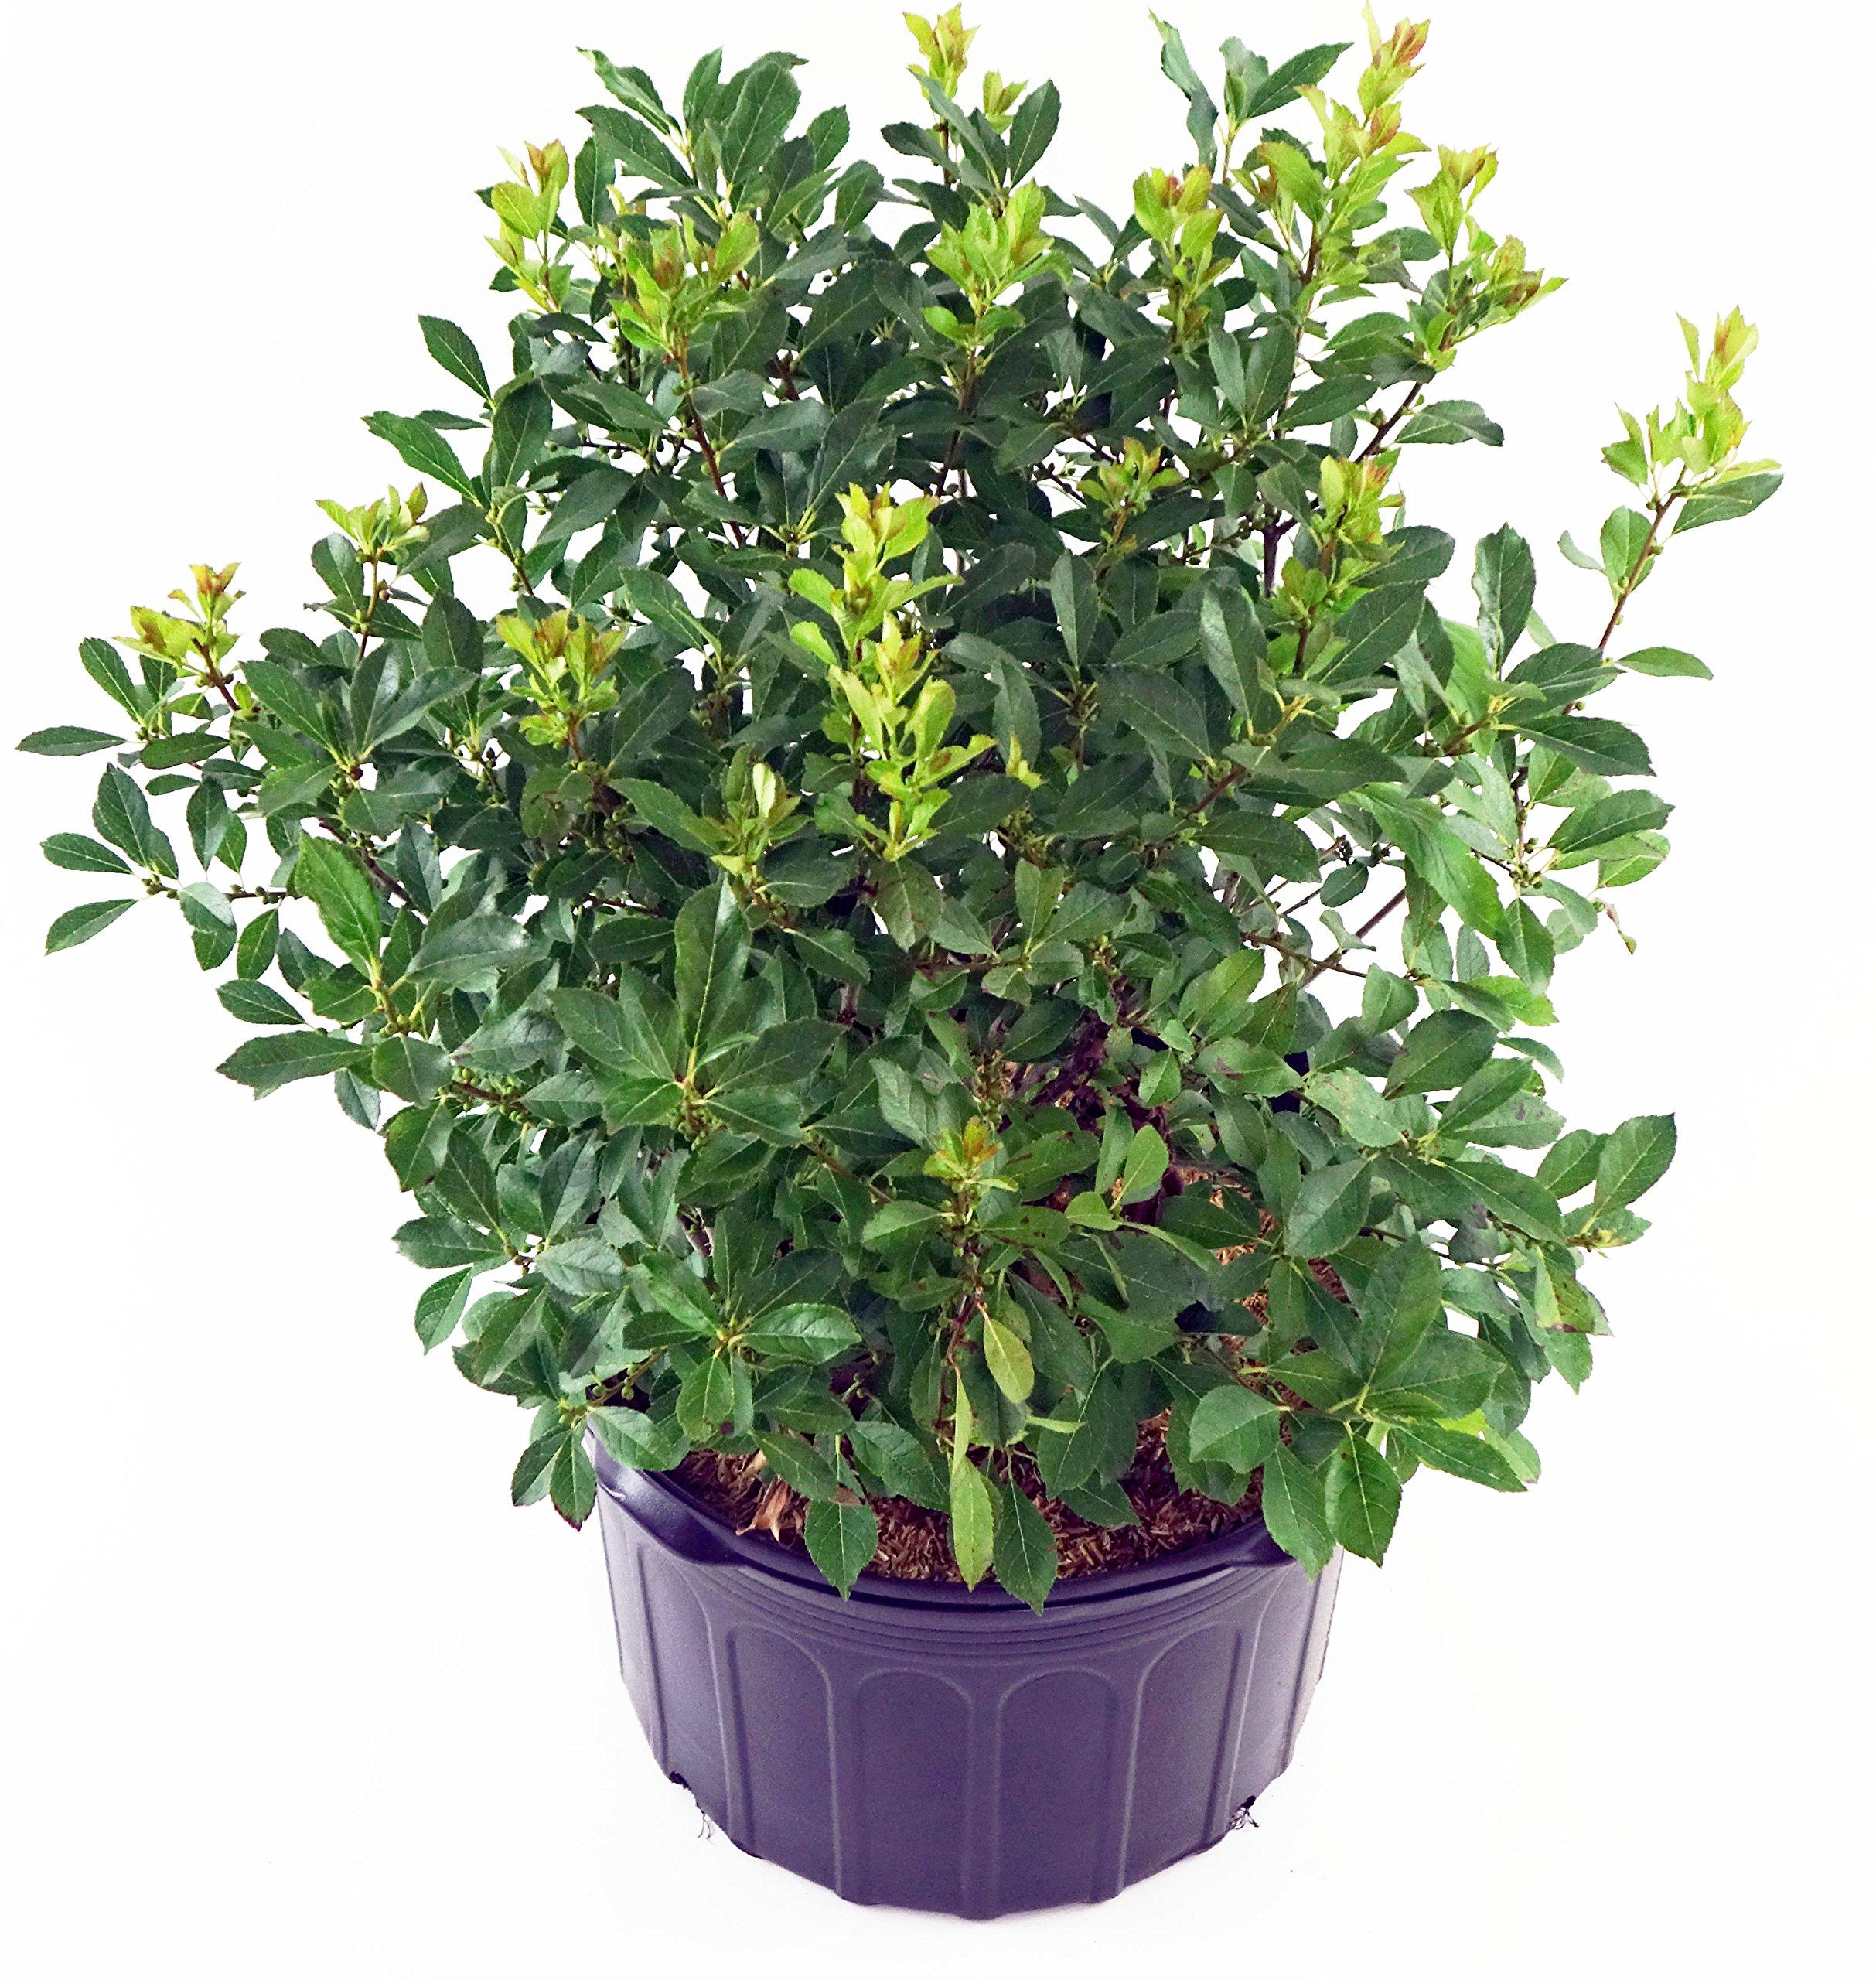 Ilex verticillata 'Red Sprite' (Winterberry) Shrub, XL red Fruit, 2 - Size Container